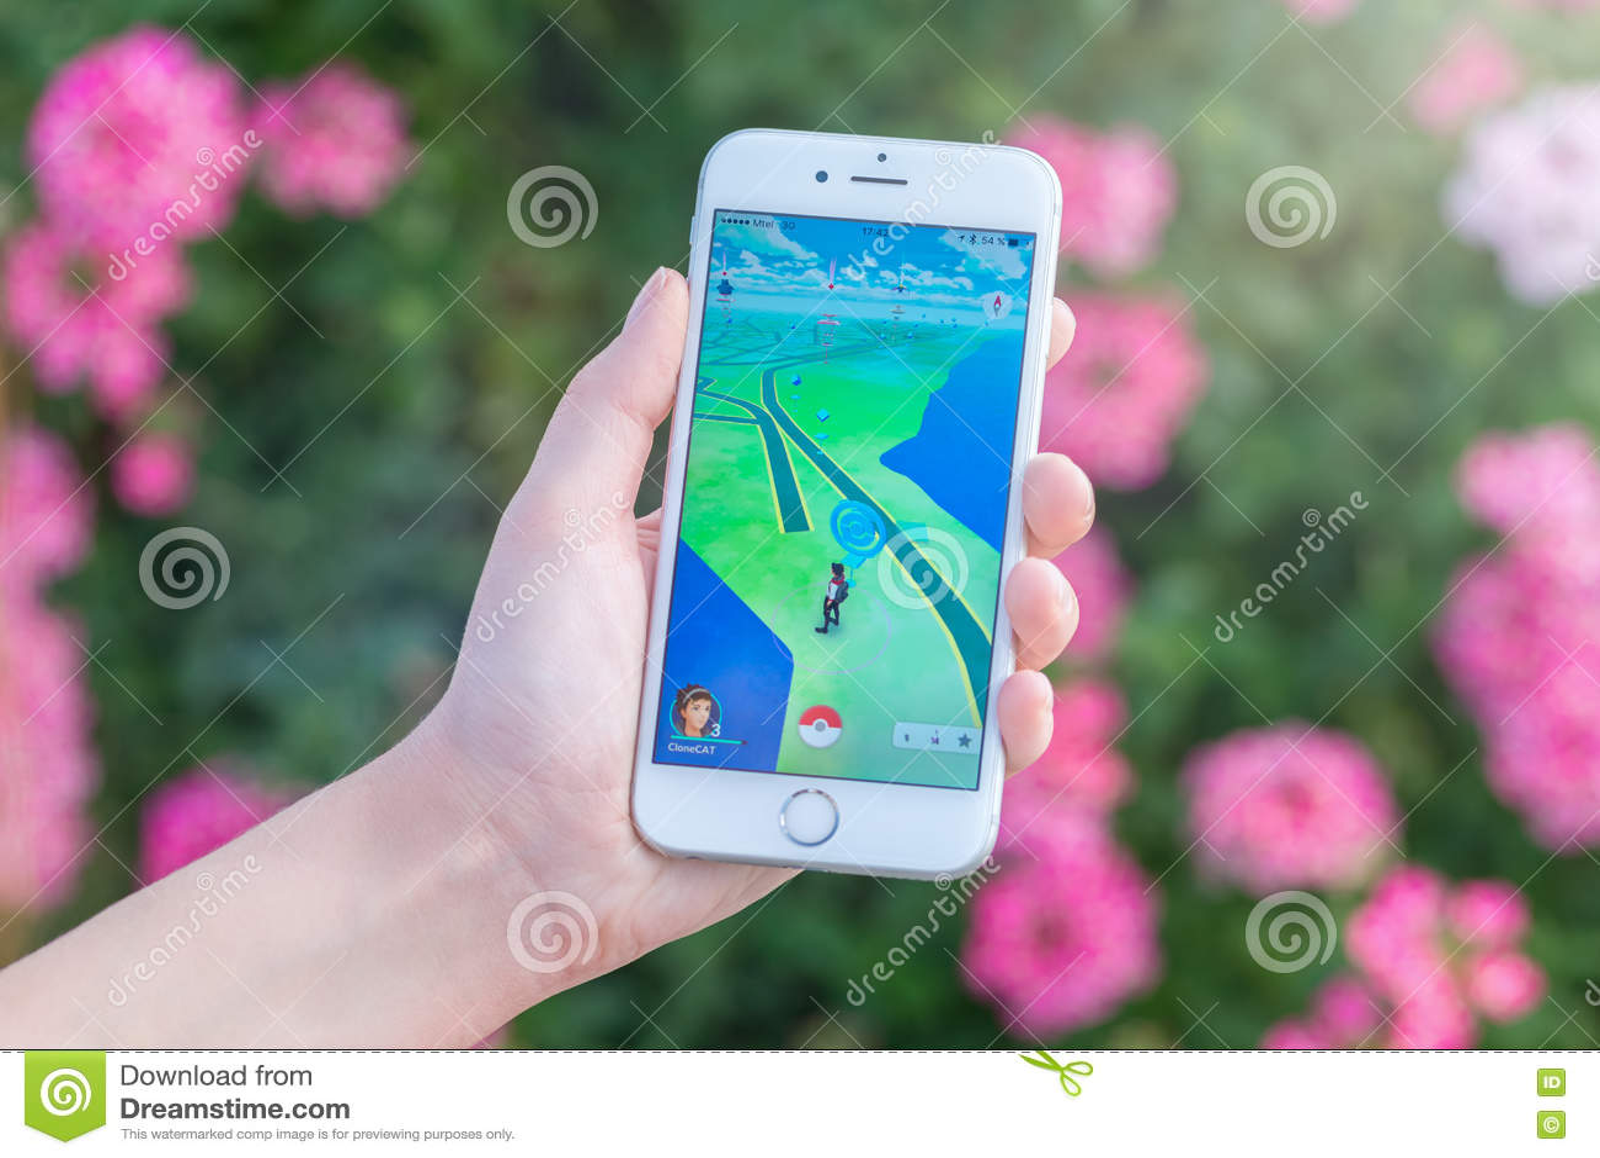 Pokemon Go App With Pokestop On The Map On Apple IPhone 6S